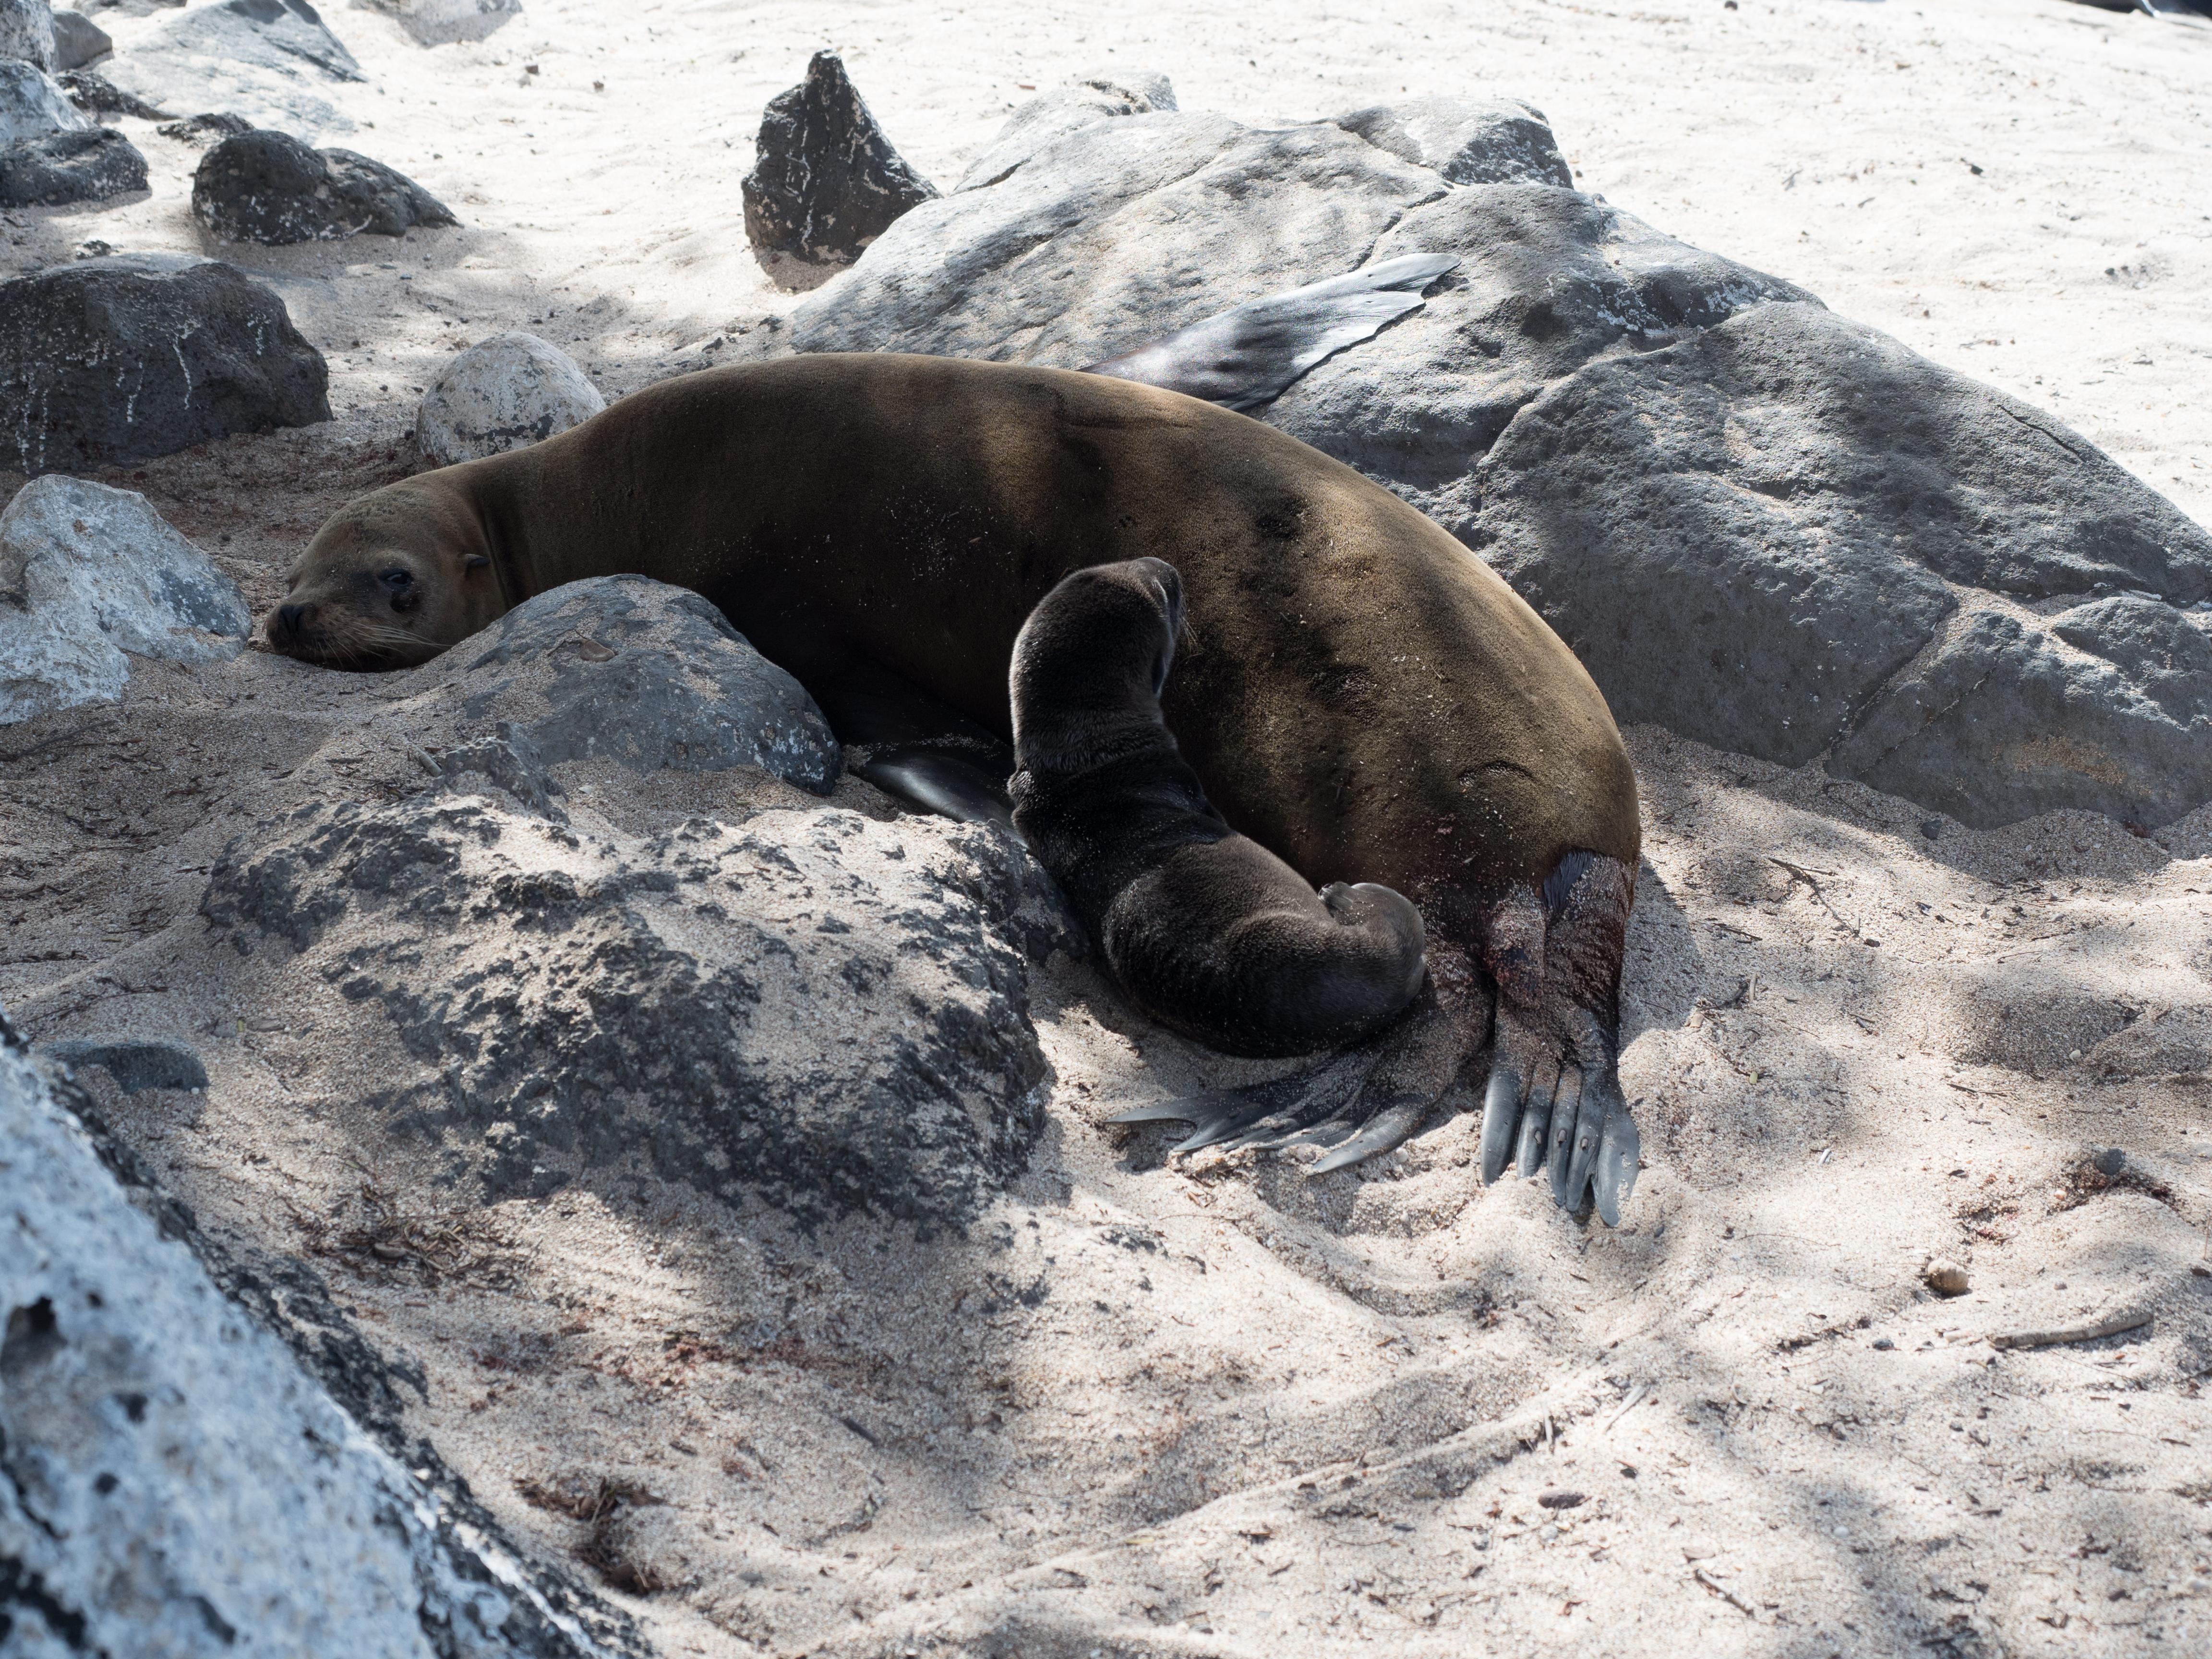 Galapagos Sea Lion Facts